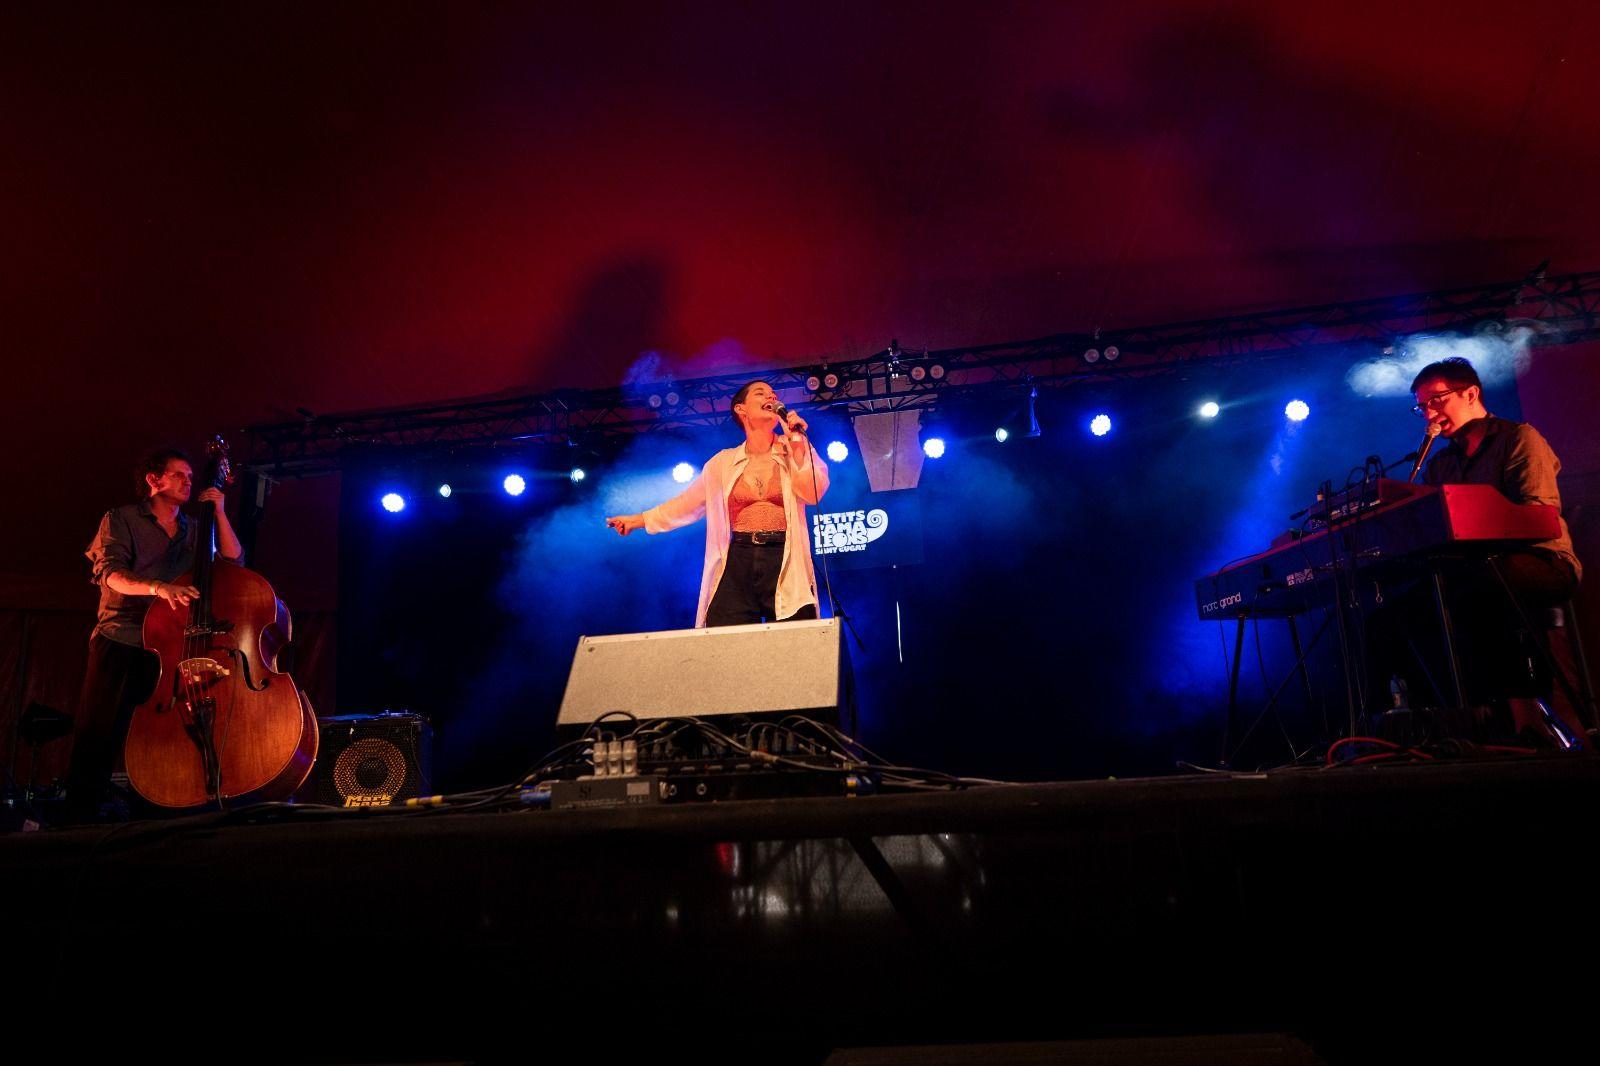 Clara Gispert al festival Petits Camaleons. Foto: Raul Clemente